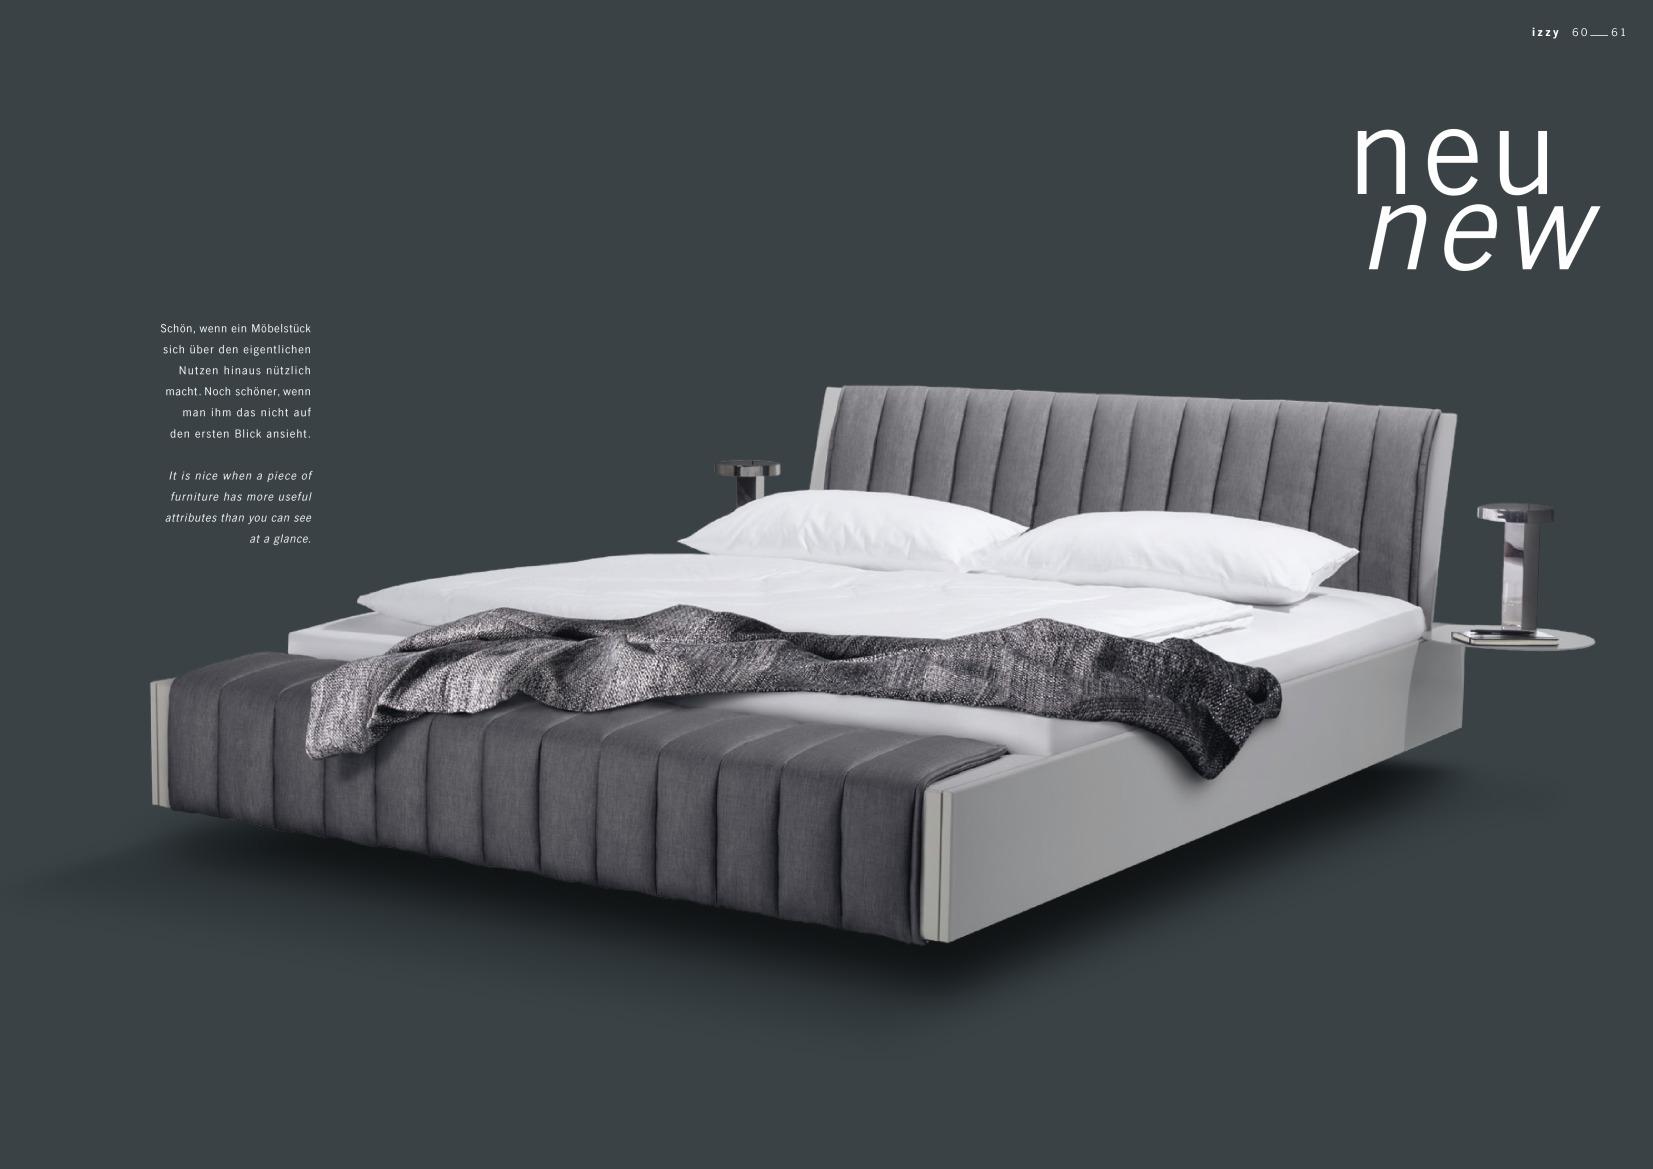 interluebke lookbook 2017 gs 29 m bel weber neustadt landau karlsruhe. Black Bedroom Furniture Sets. Home Design Ideas